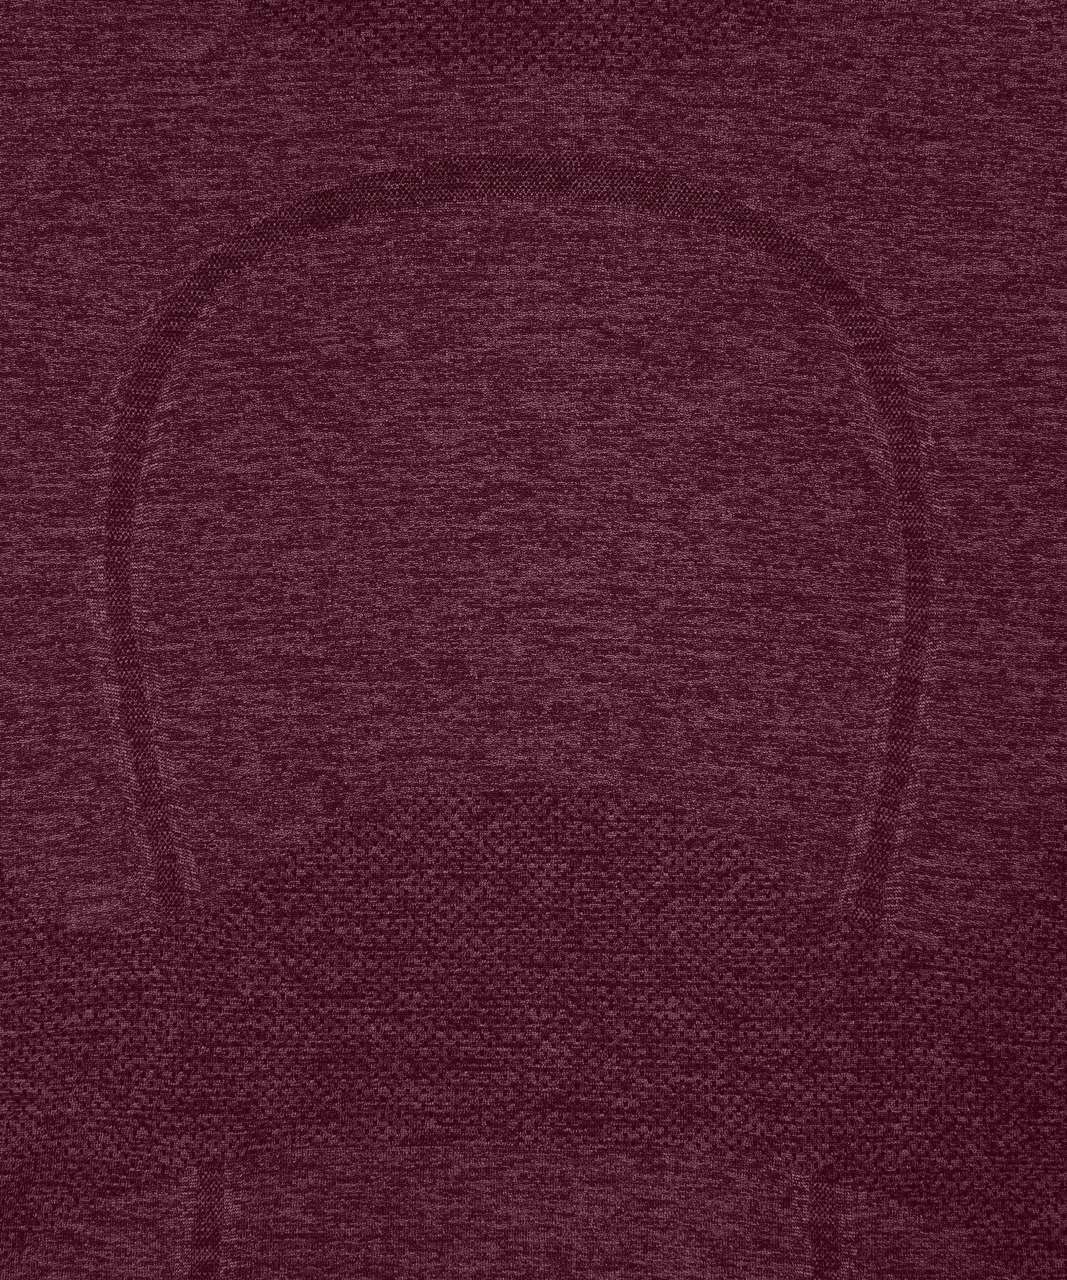 Lululemon Swiftly Tech Long Sleeve Crew - Dark Adobe / Misty Merlot